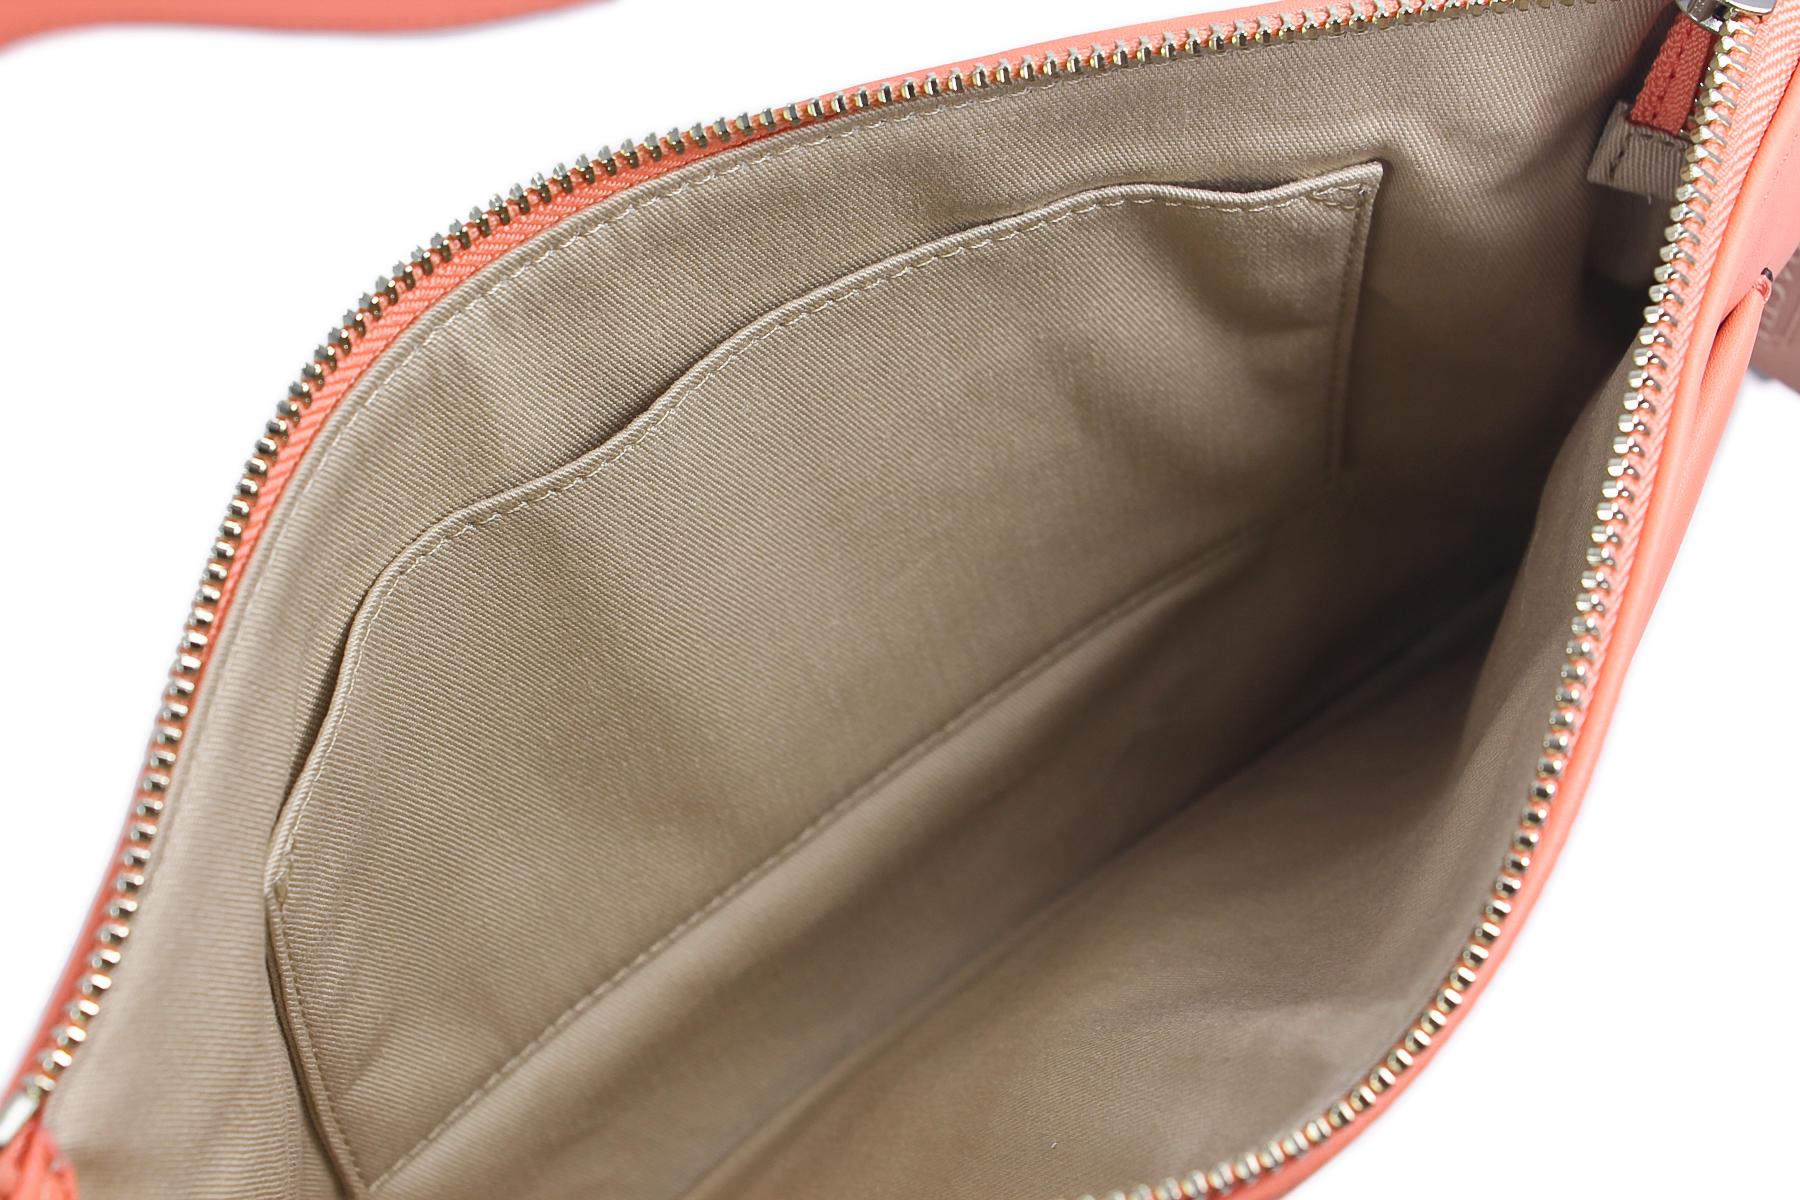 burberry handbags outlet online  handbags & bags